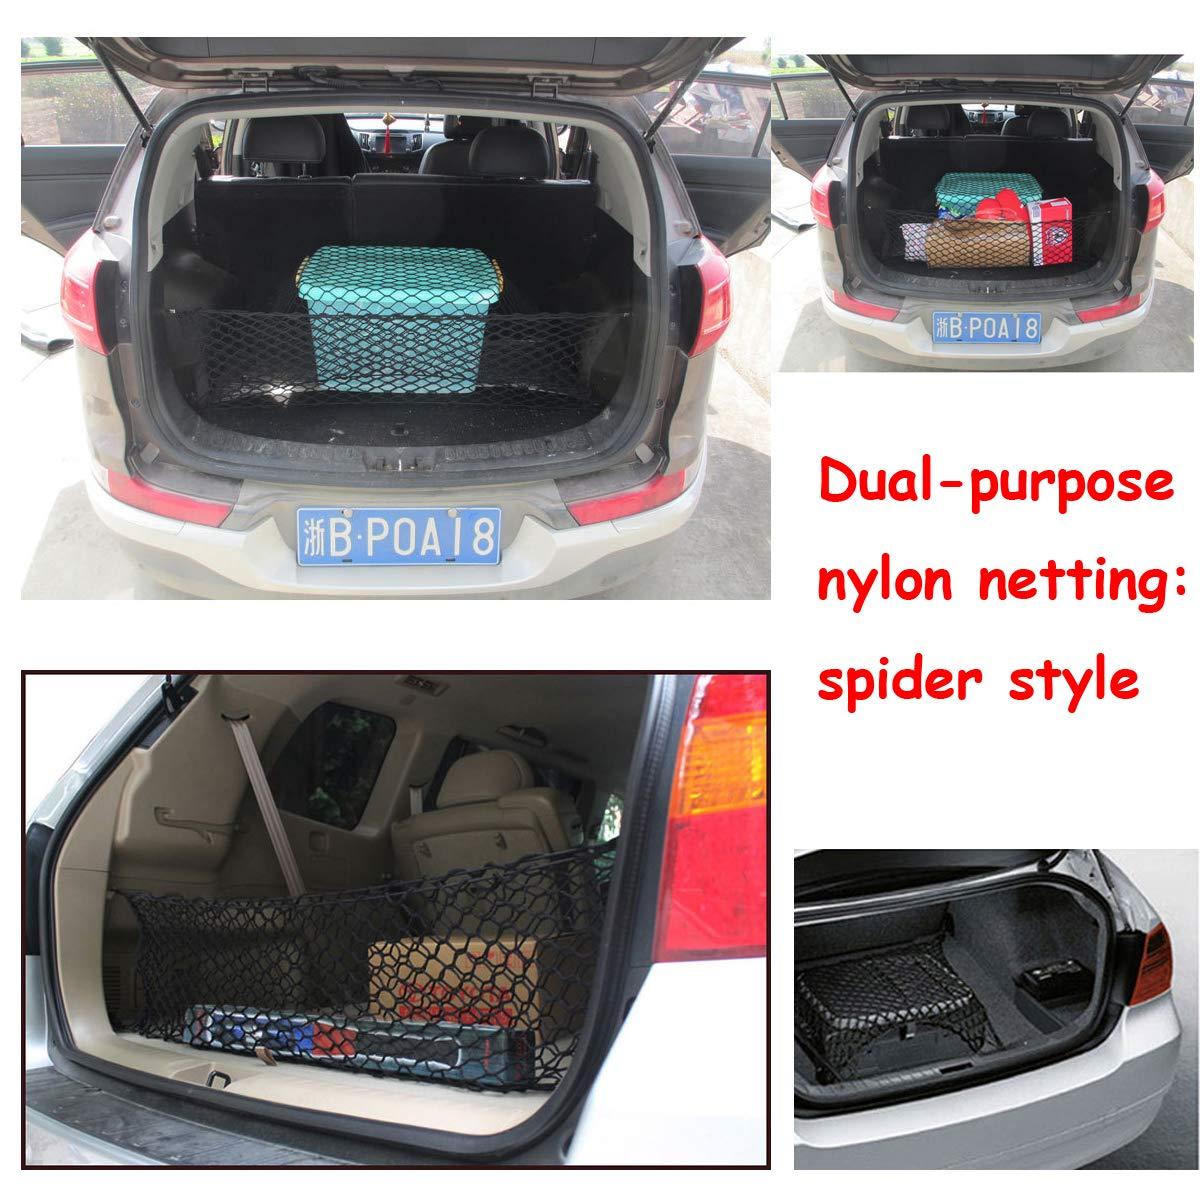 35.4 X 15.7 in Bonaweite Auto Elastic Double layer Universal Car Cargo Trunk Rear Net Storage Bag Flexible Hammock Luggage Organizer